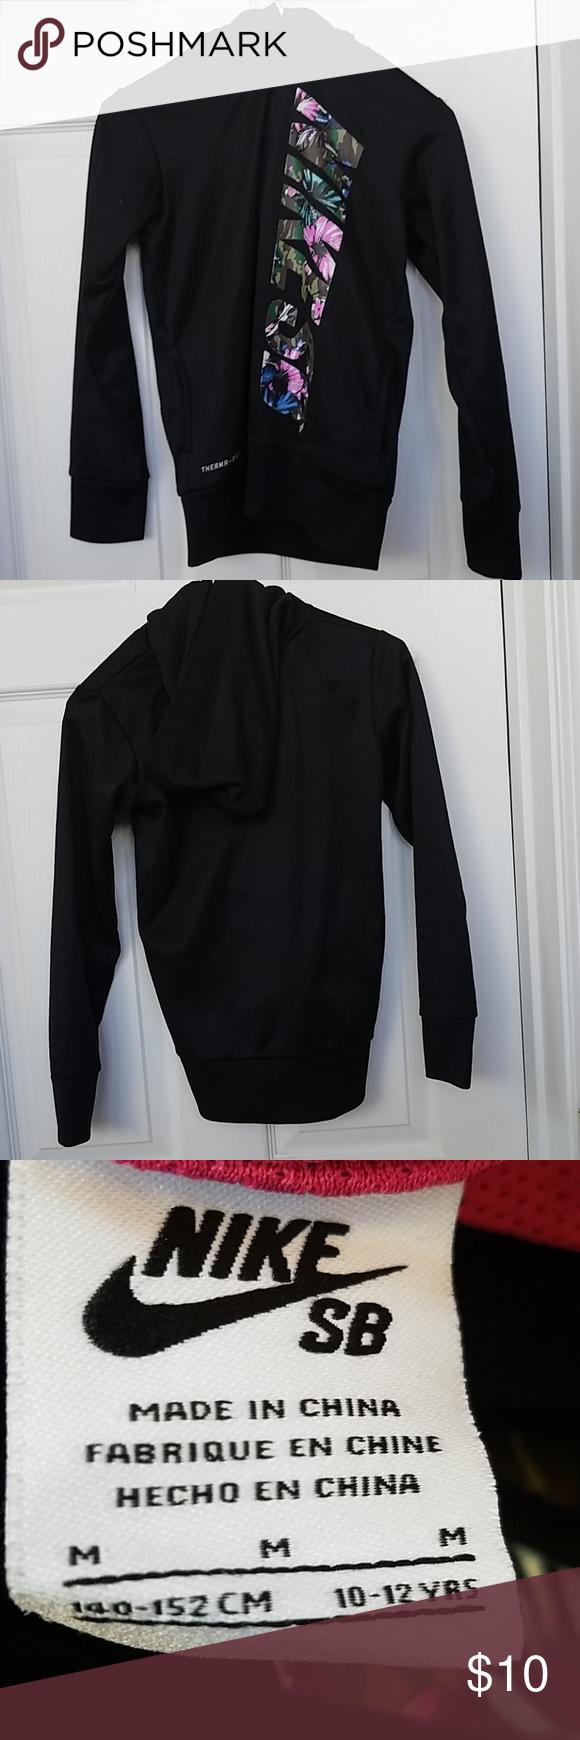 Nike Girls' sweatshirt Medium 10-12 years old | Nikes girl, Girl ...